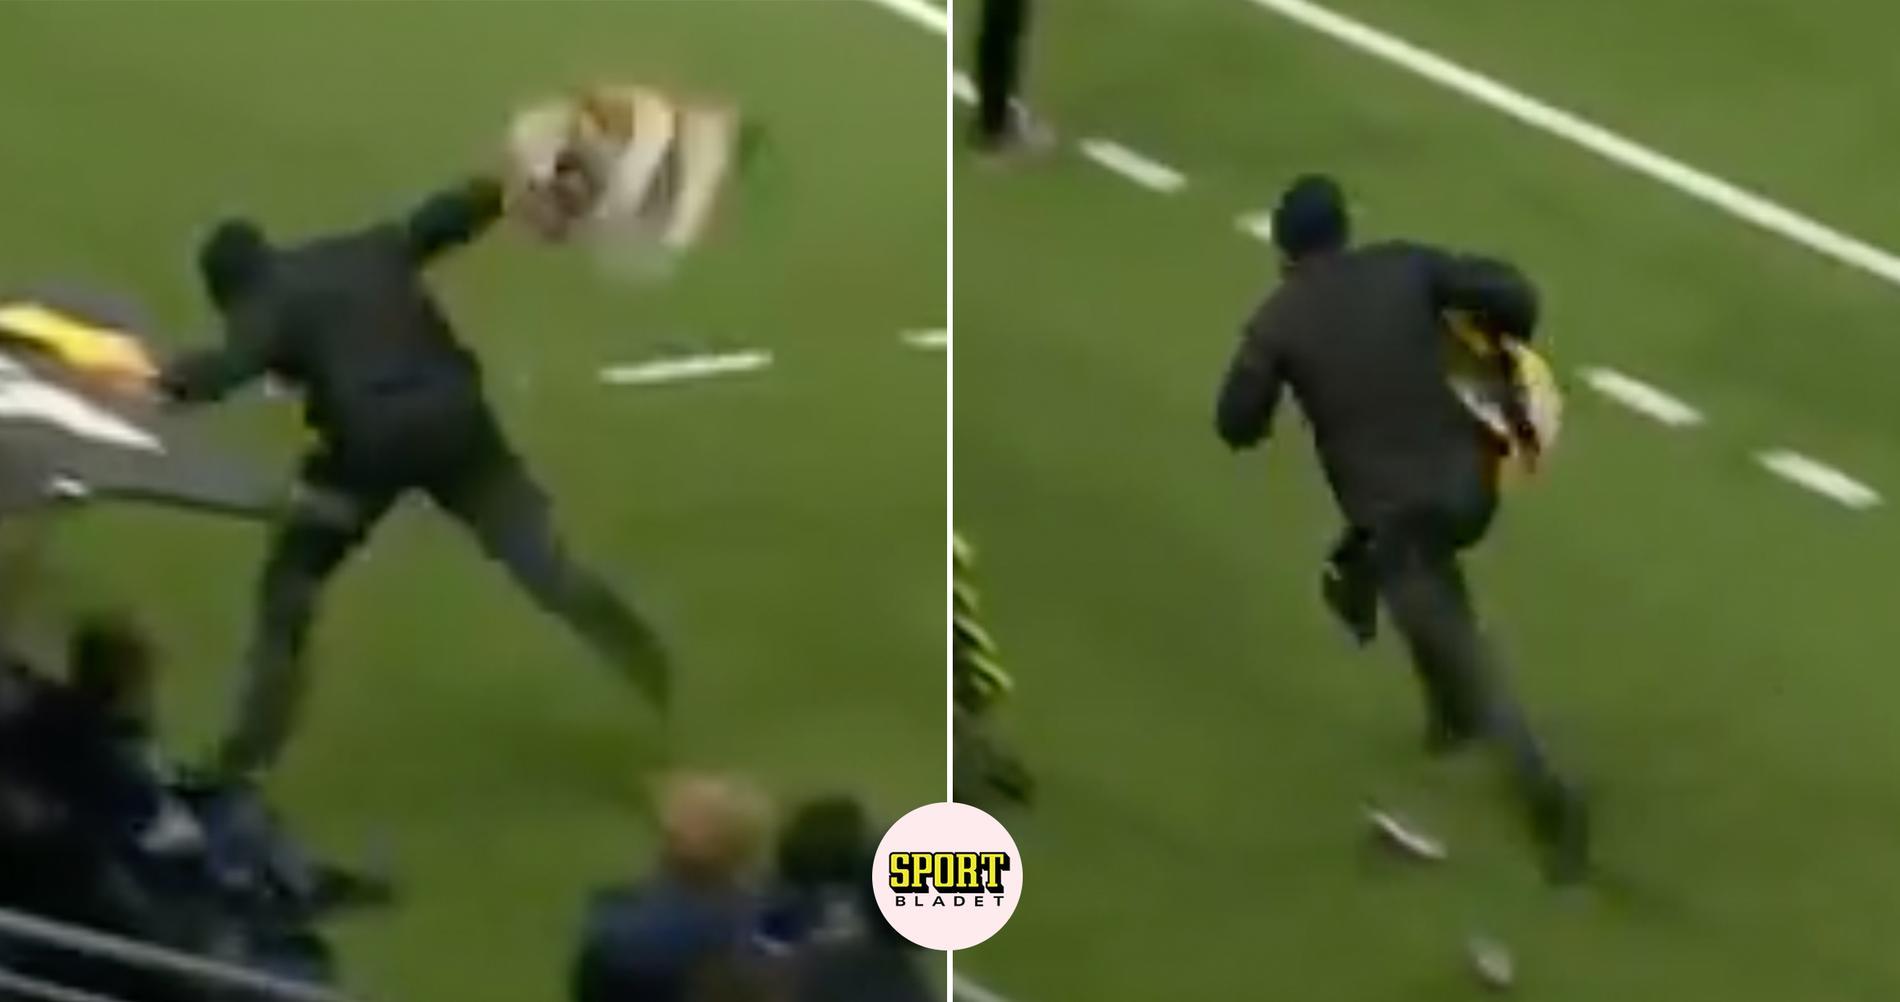 Supporter stal en flagga – ramlade